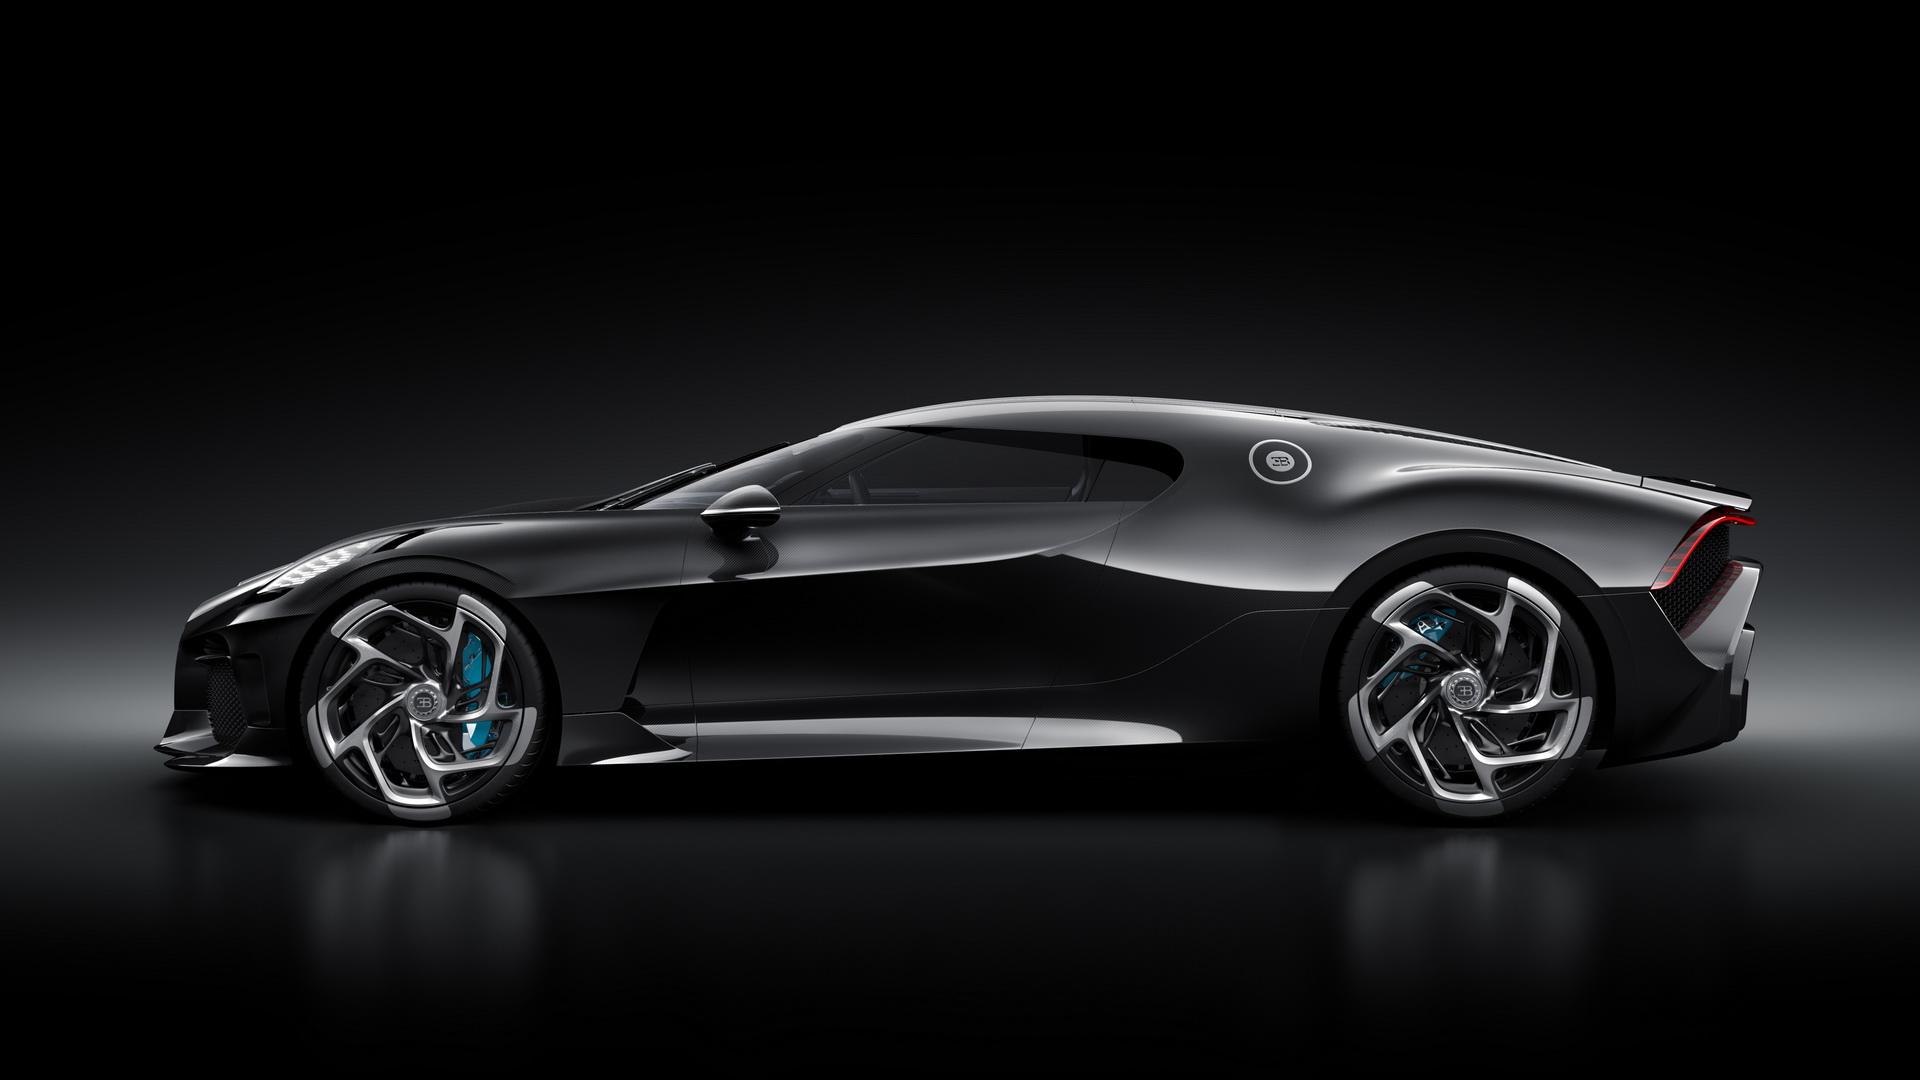 d34a241e-2019-bugatti-la-voiture-noire-3.jpg